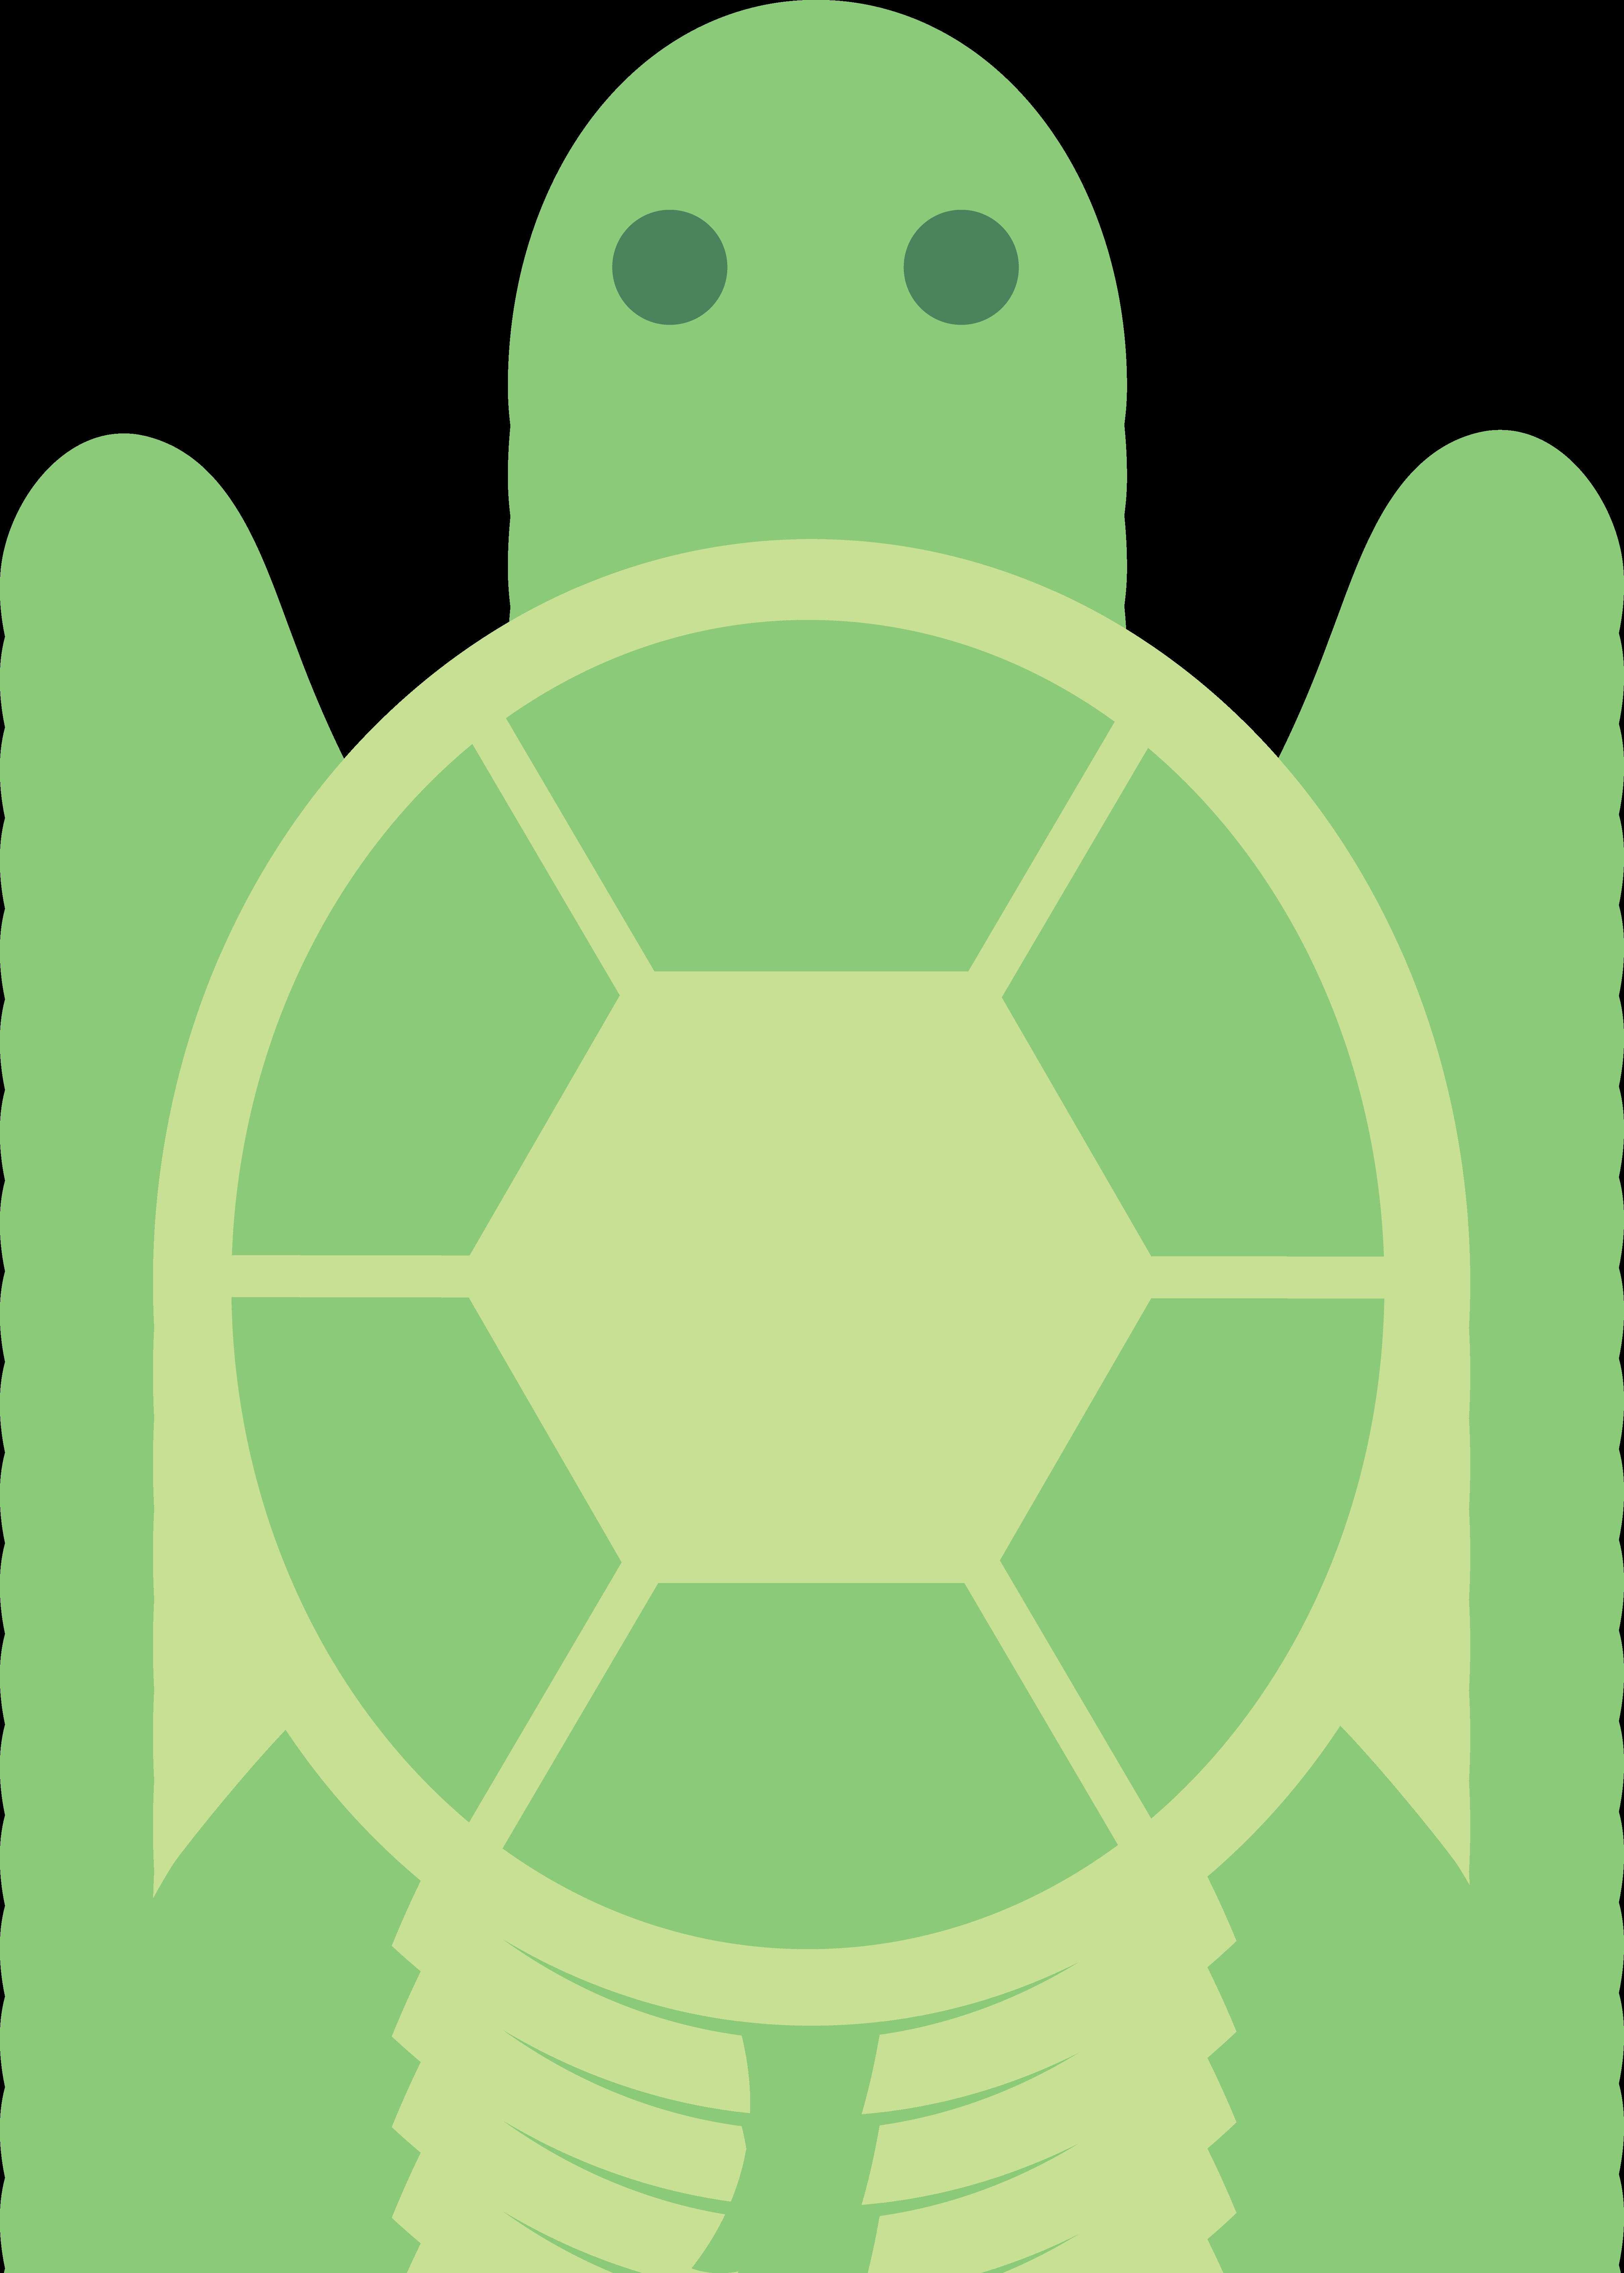 Turtle clipart tiny #2